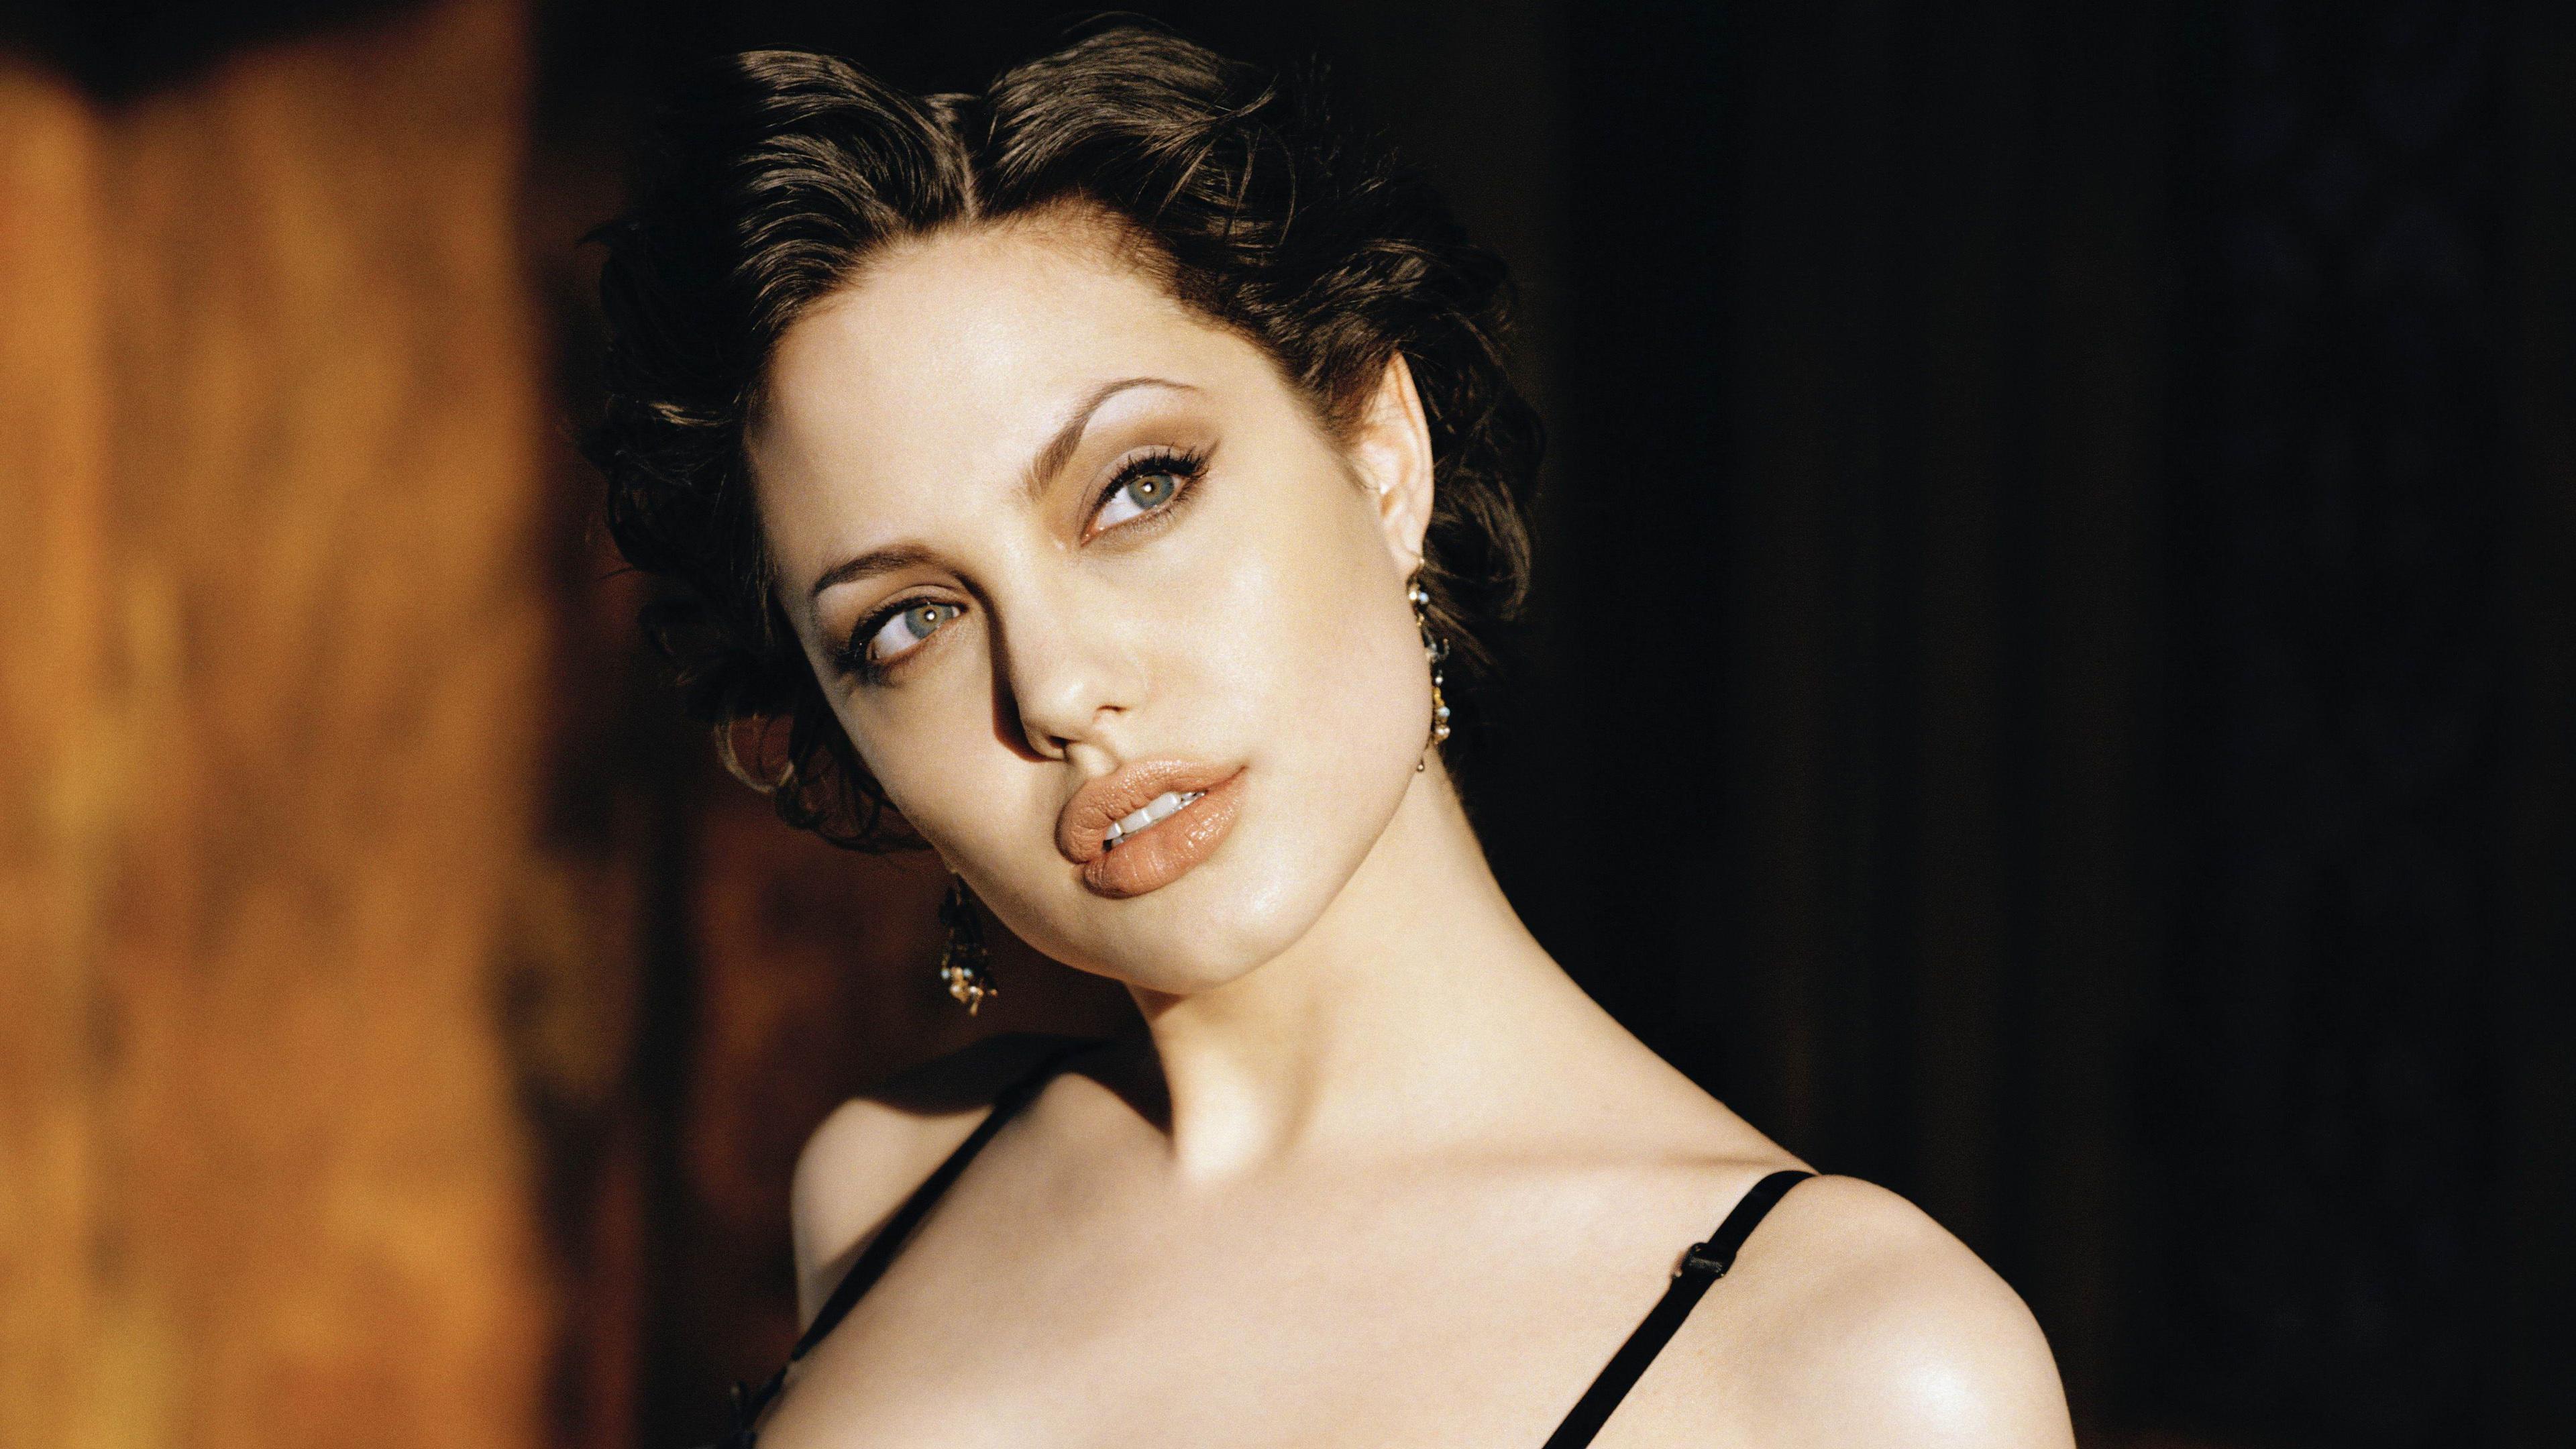 angelina jolie 4k 1536950624 - Angelina Jolie 4k - hd-wallpapers, girls wallpapers, celebrities wallpapers, angelina jolie wallpapers, 4k-wallpapers